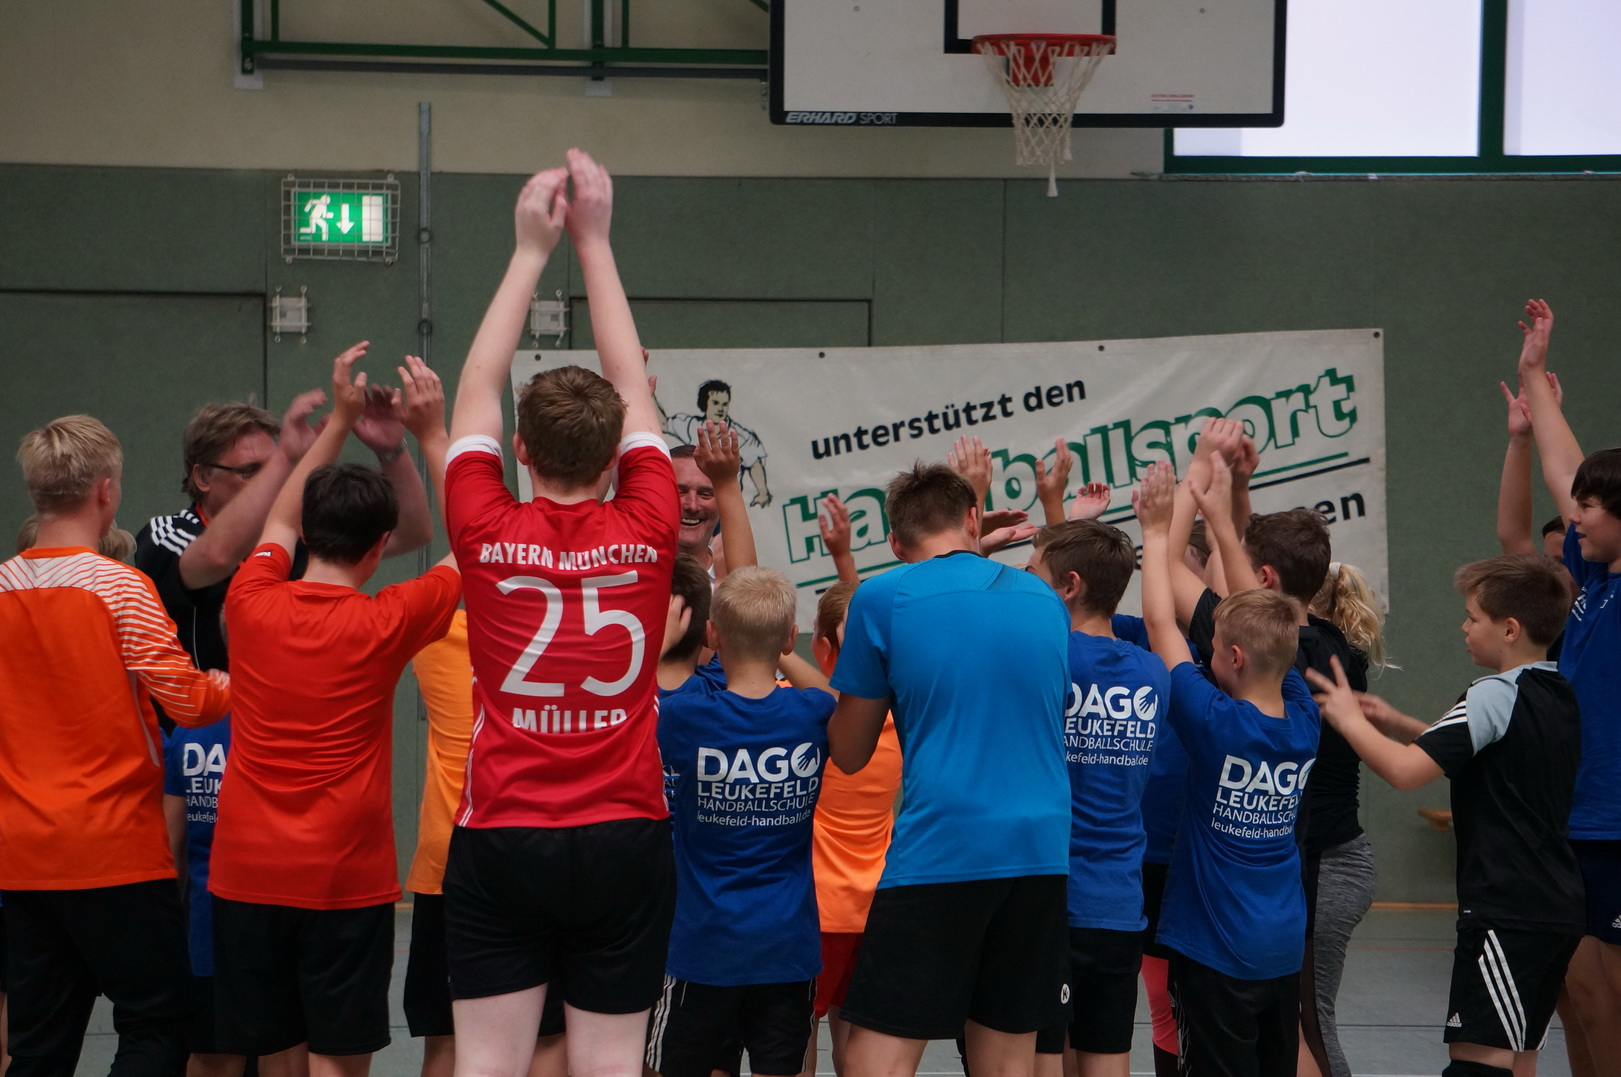 201808_Handballcamp_SDH_MG_293w